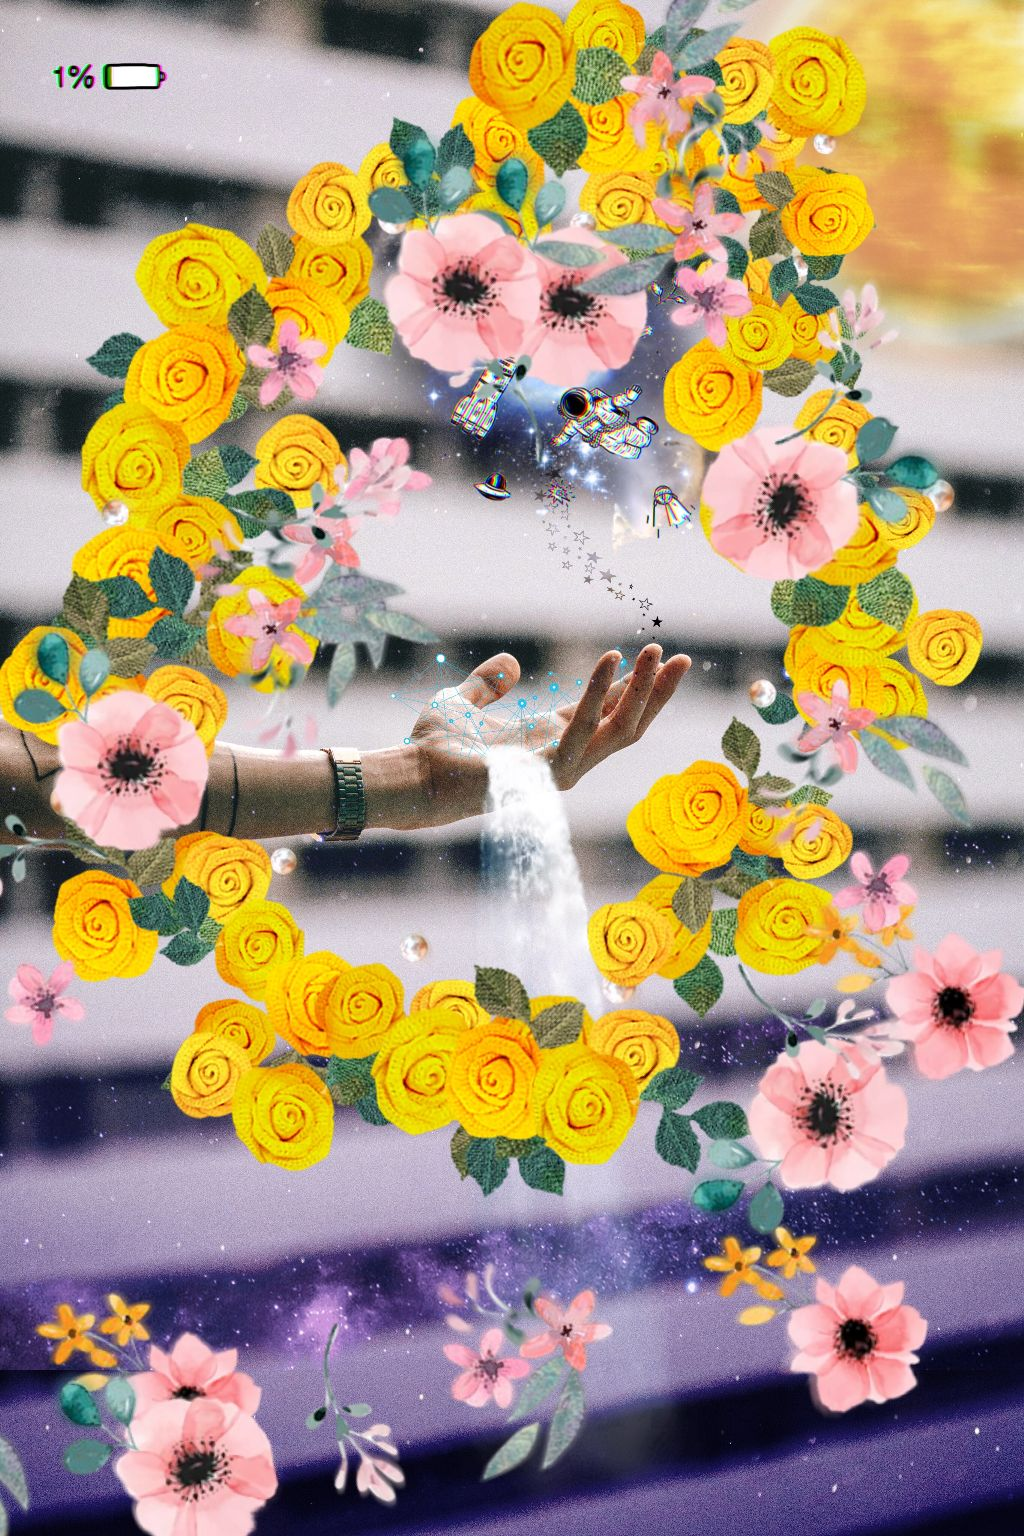 #flower #power #music #nature